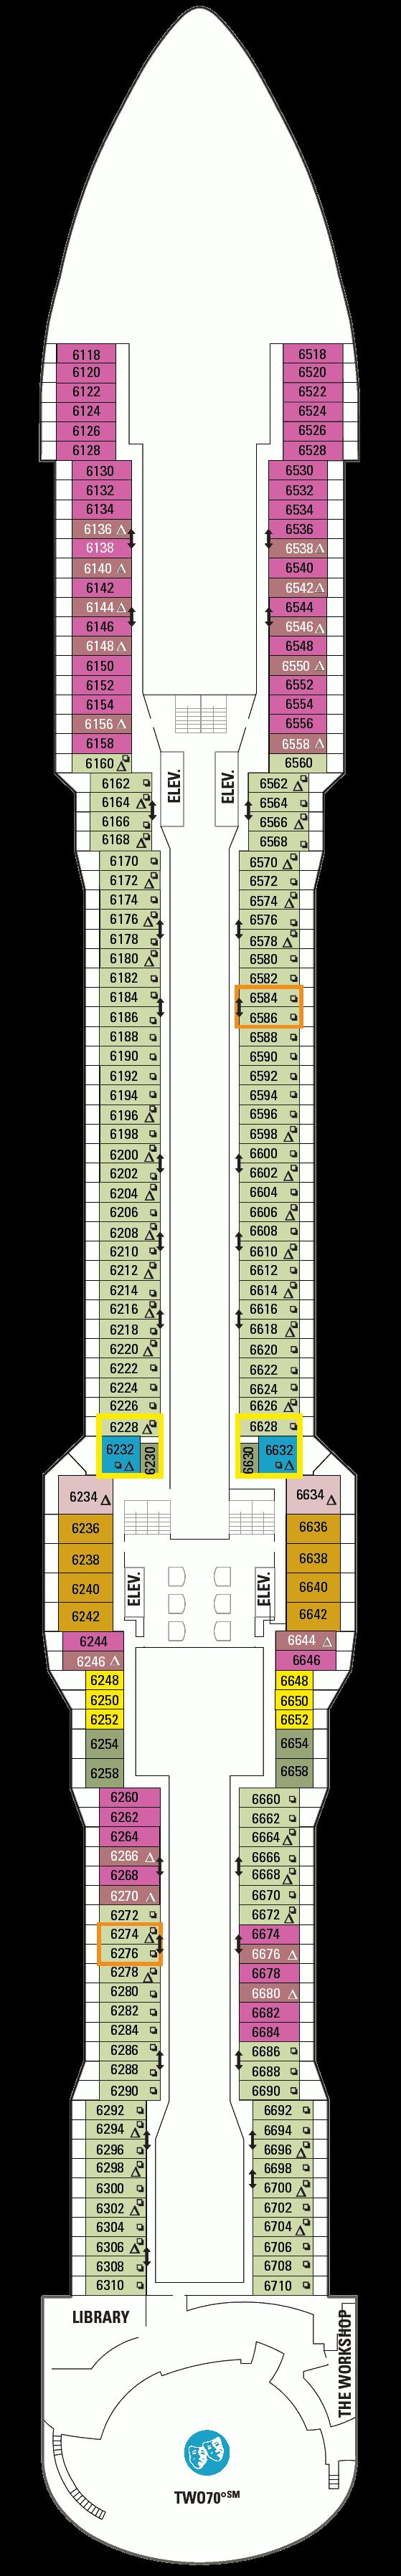 Ovation of the Seas Deck 6